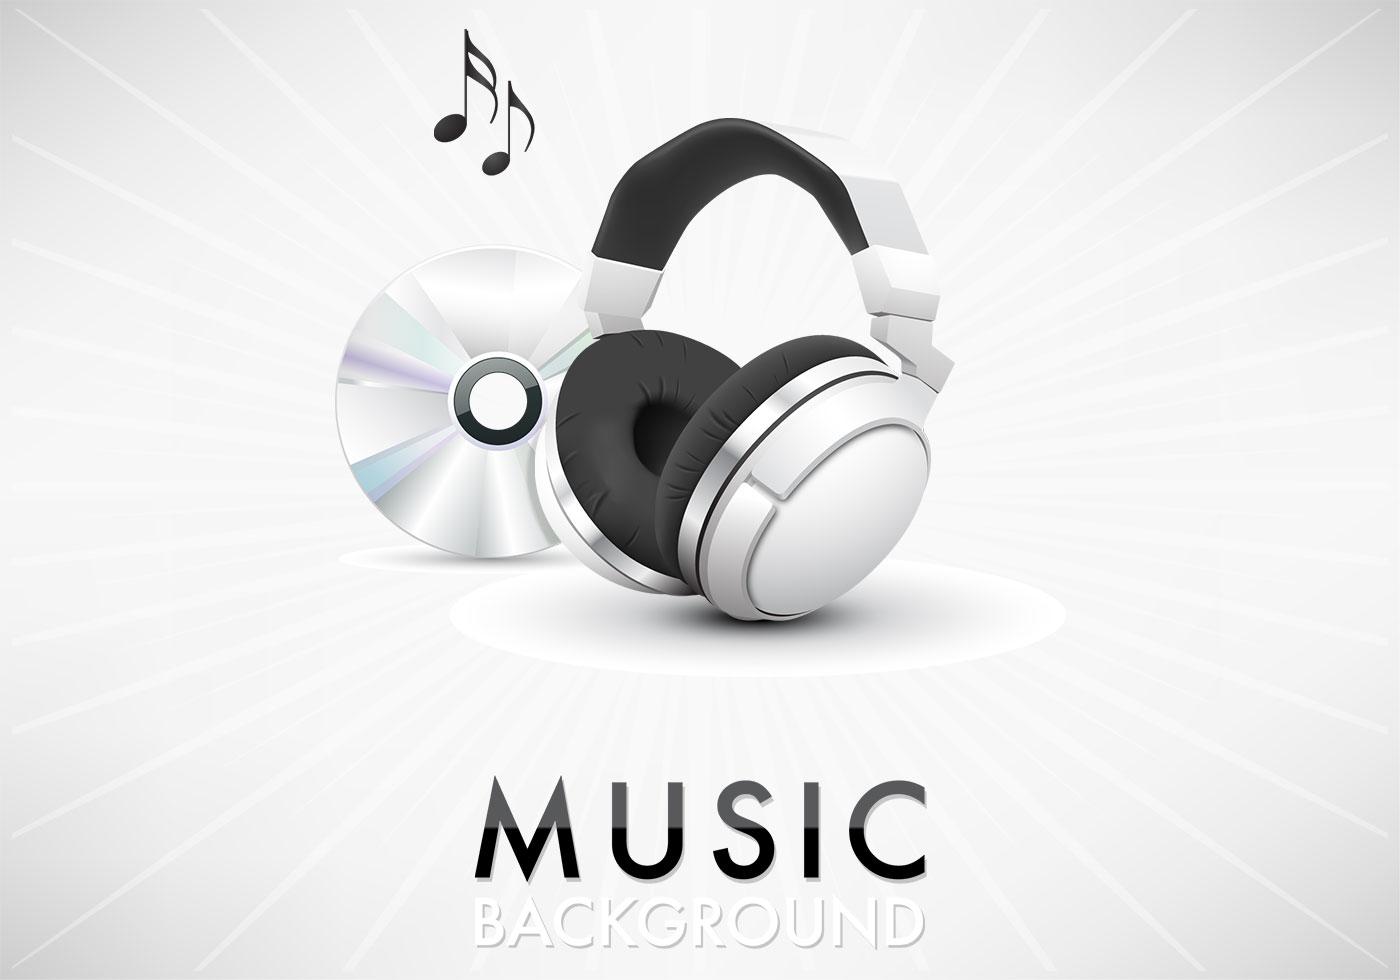 Music Headphone Background PSD - Free Photoshop Brushes at ...